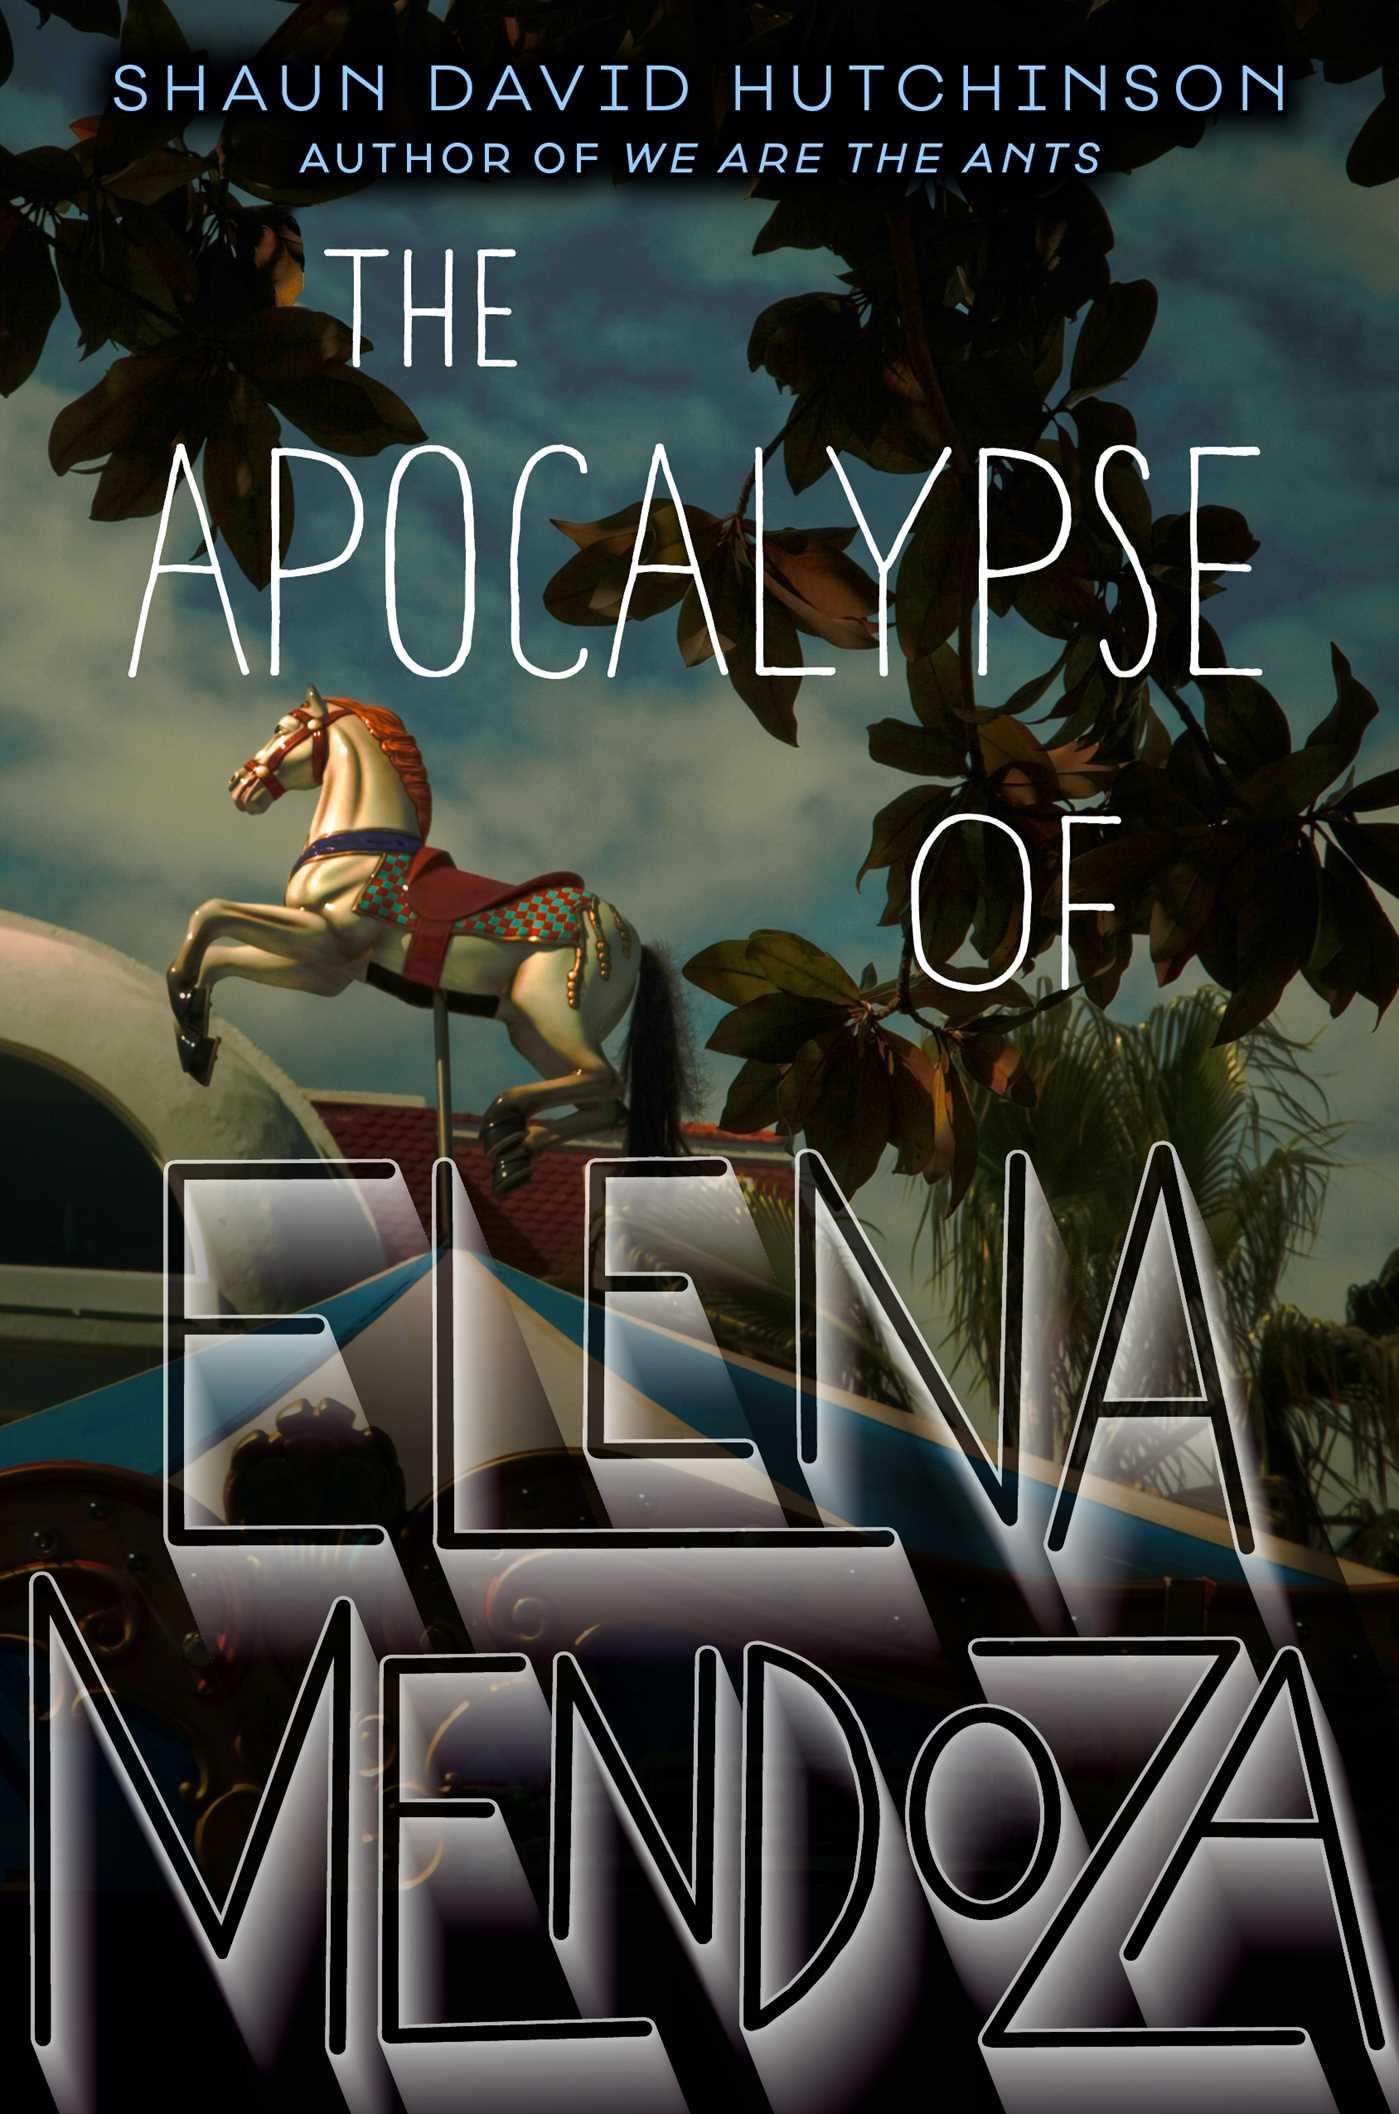 The apocalypse of elena mendoza 9781481498548 hr